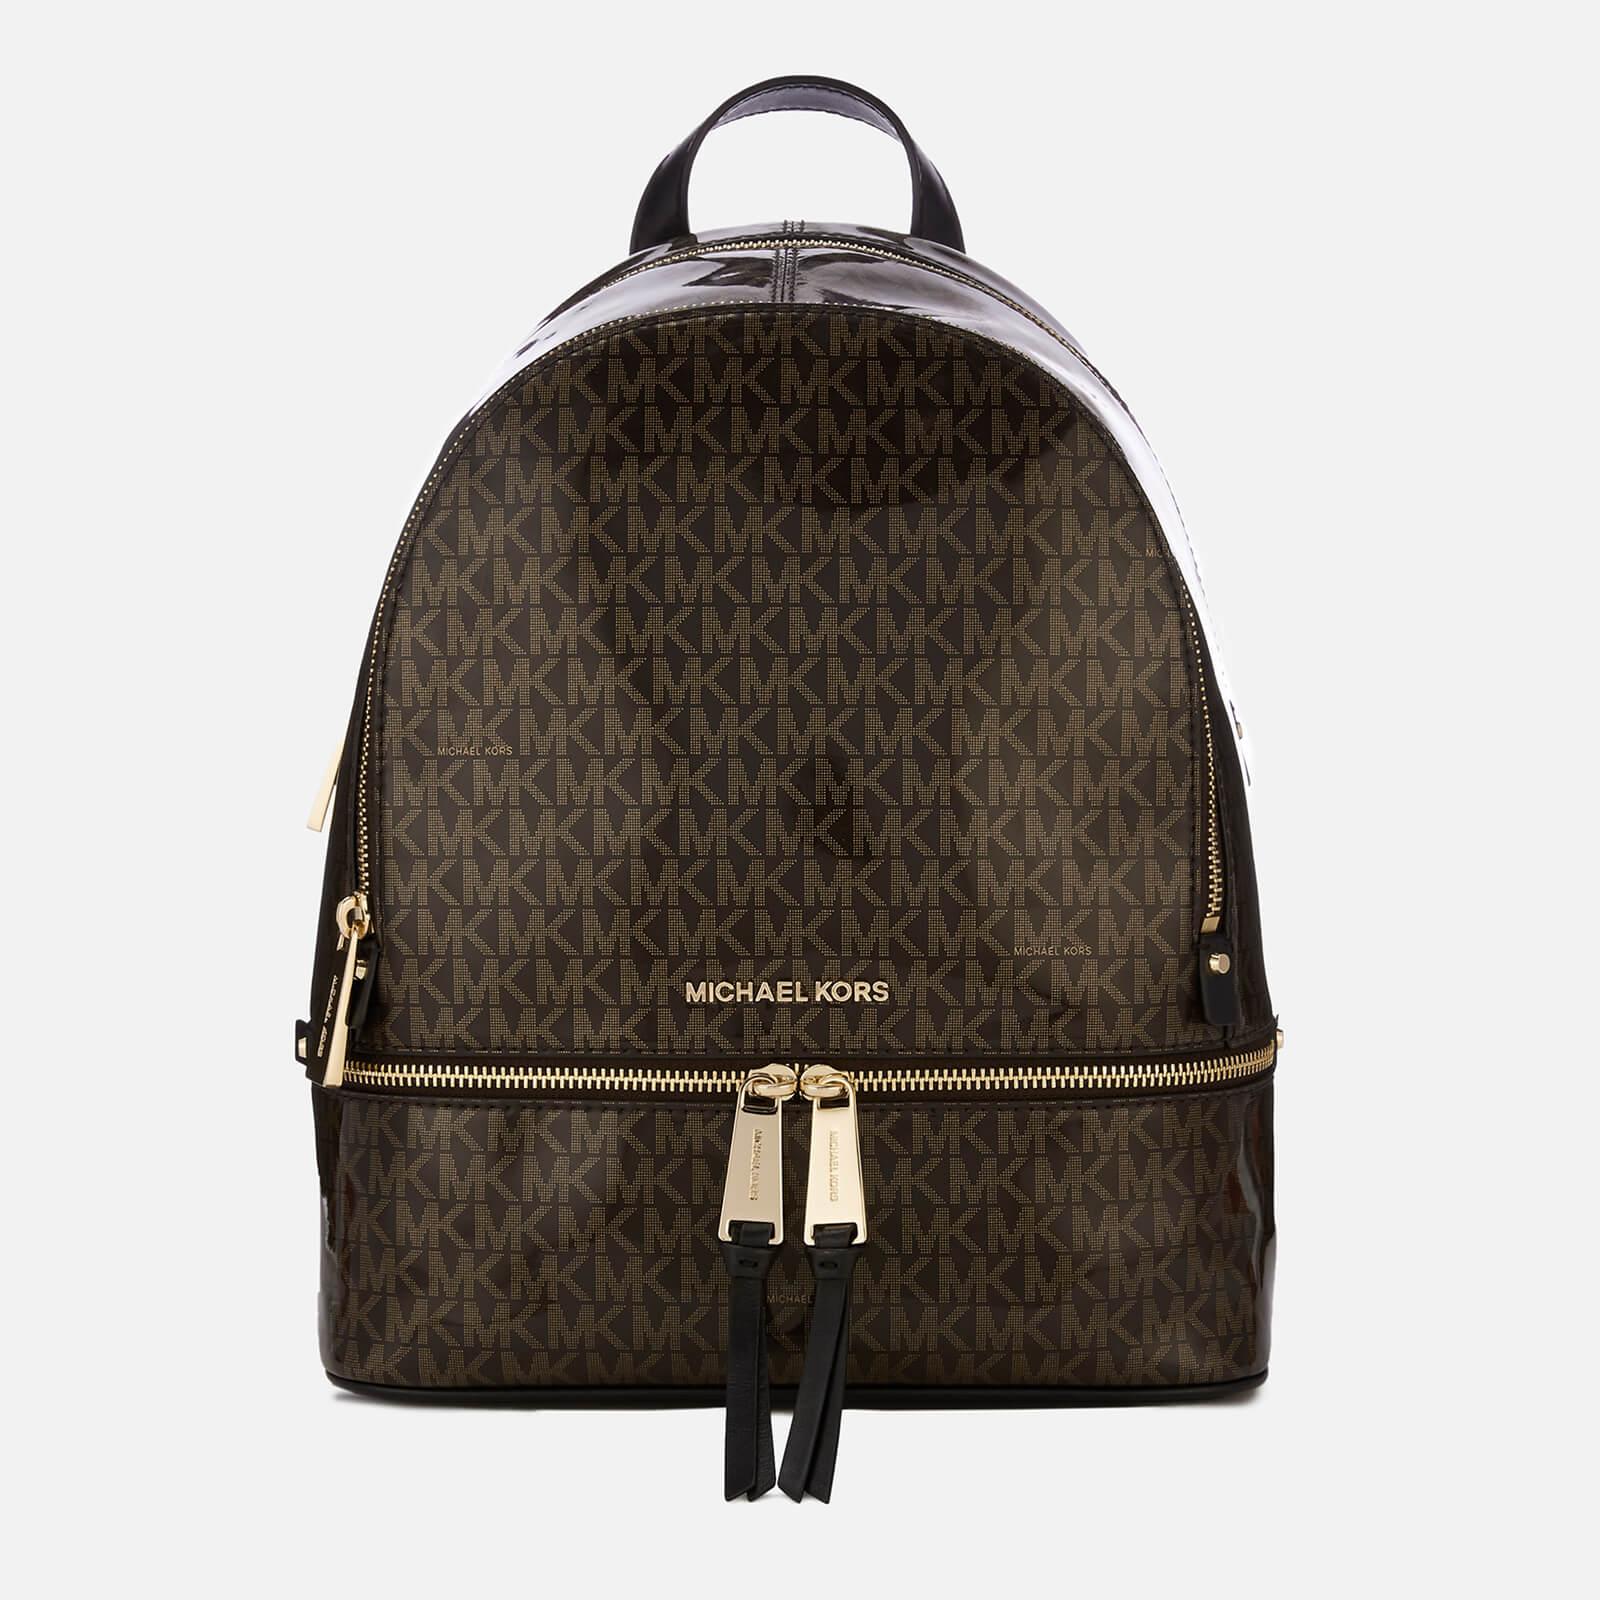 5faf6bf3a35486 MICHAEL MICHAEL KORS Women's Rhea Zip Backpack - Signature Womens  Accessories | TheHut.com